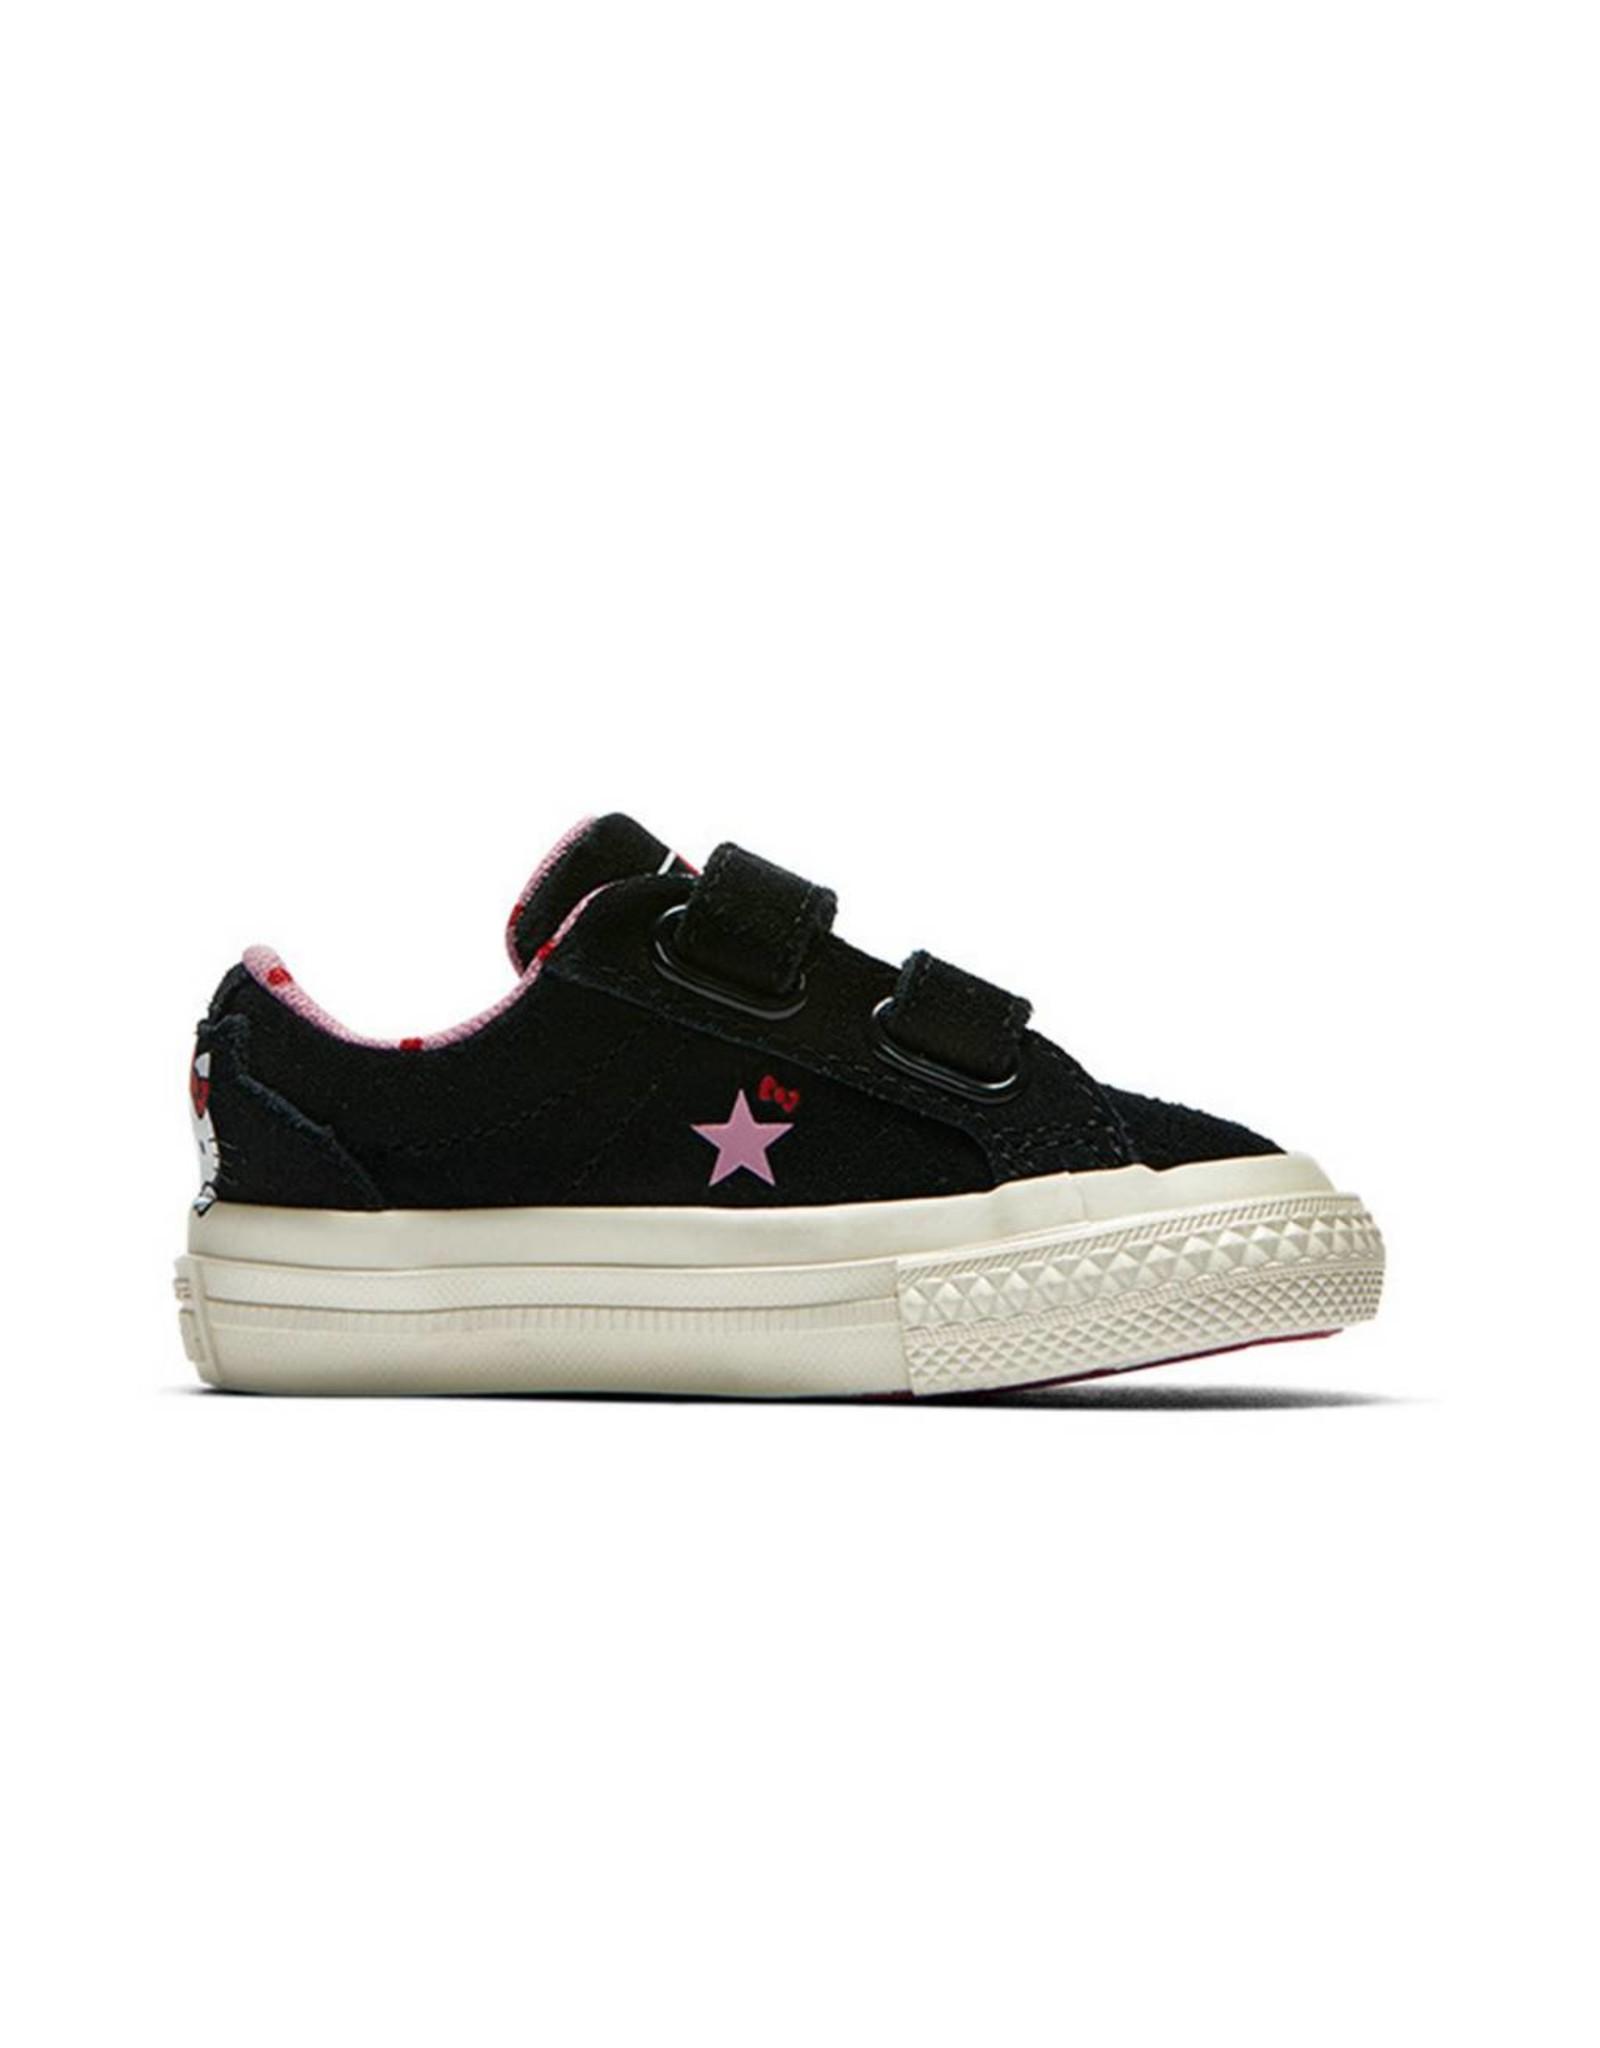 CONVERSE ONE STAR 2V HELLO KITTY OX BLACK/PRISM PINK/EGRET HELLO KITTY CRVP-762942C